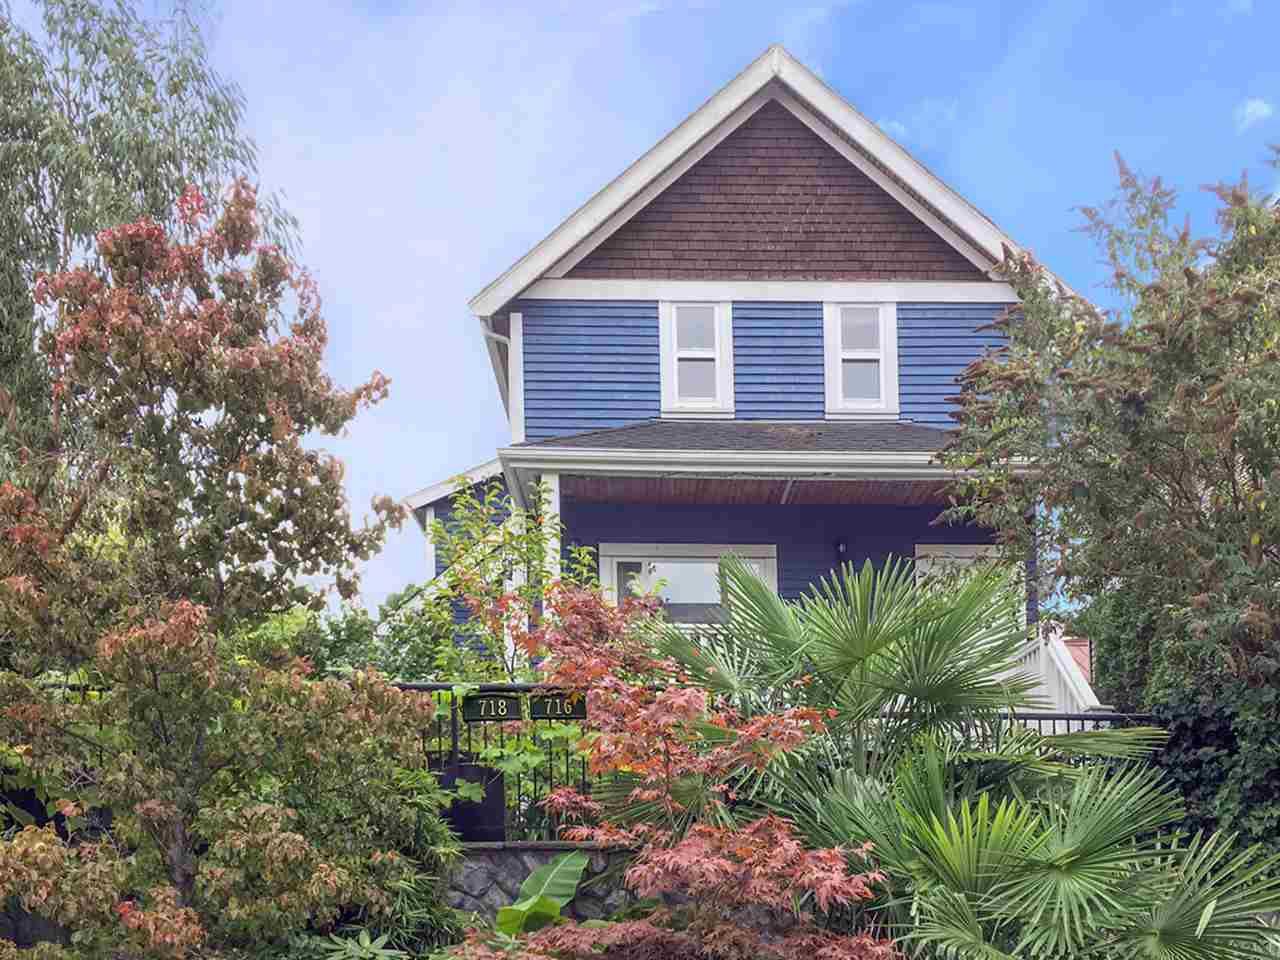 Main Photo: 716 UNION Street in Vancouver: Mount Pleasant VE House 1/2 Duplex for sale (Vancouver East)  : MLS®# R2218146